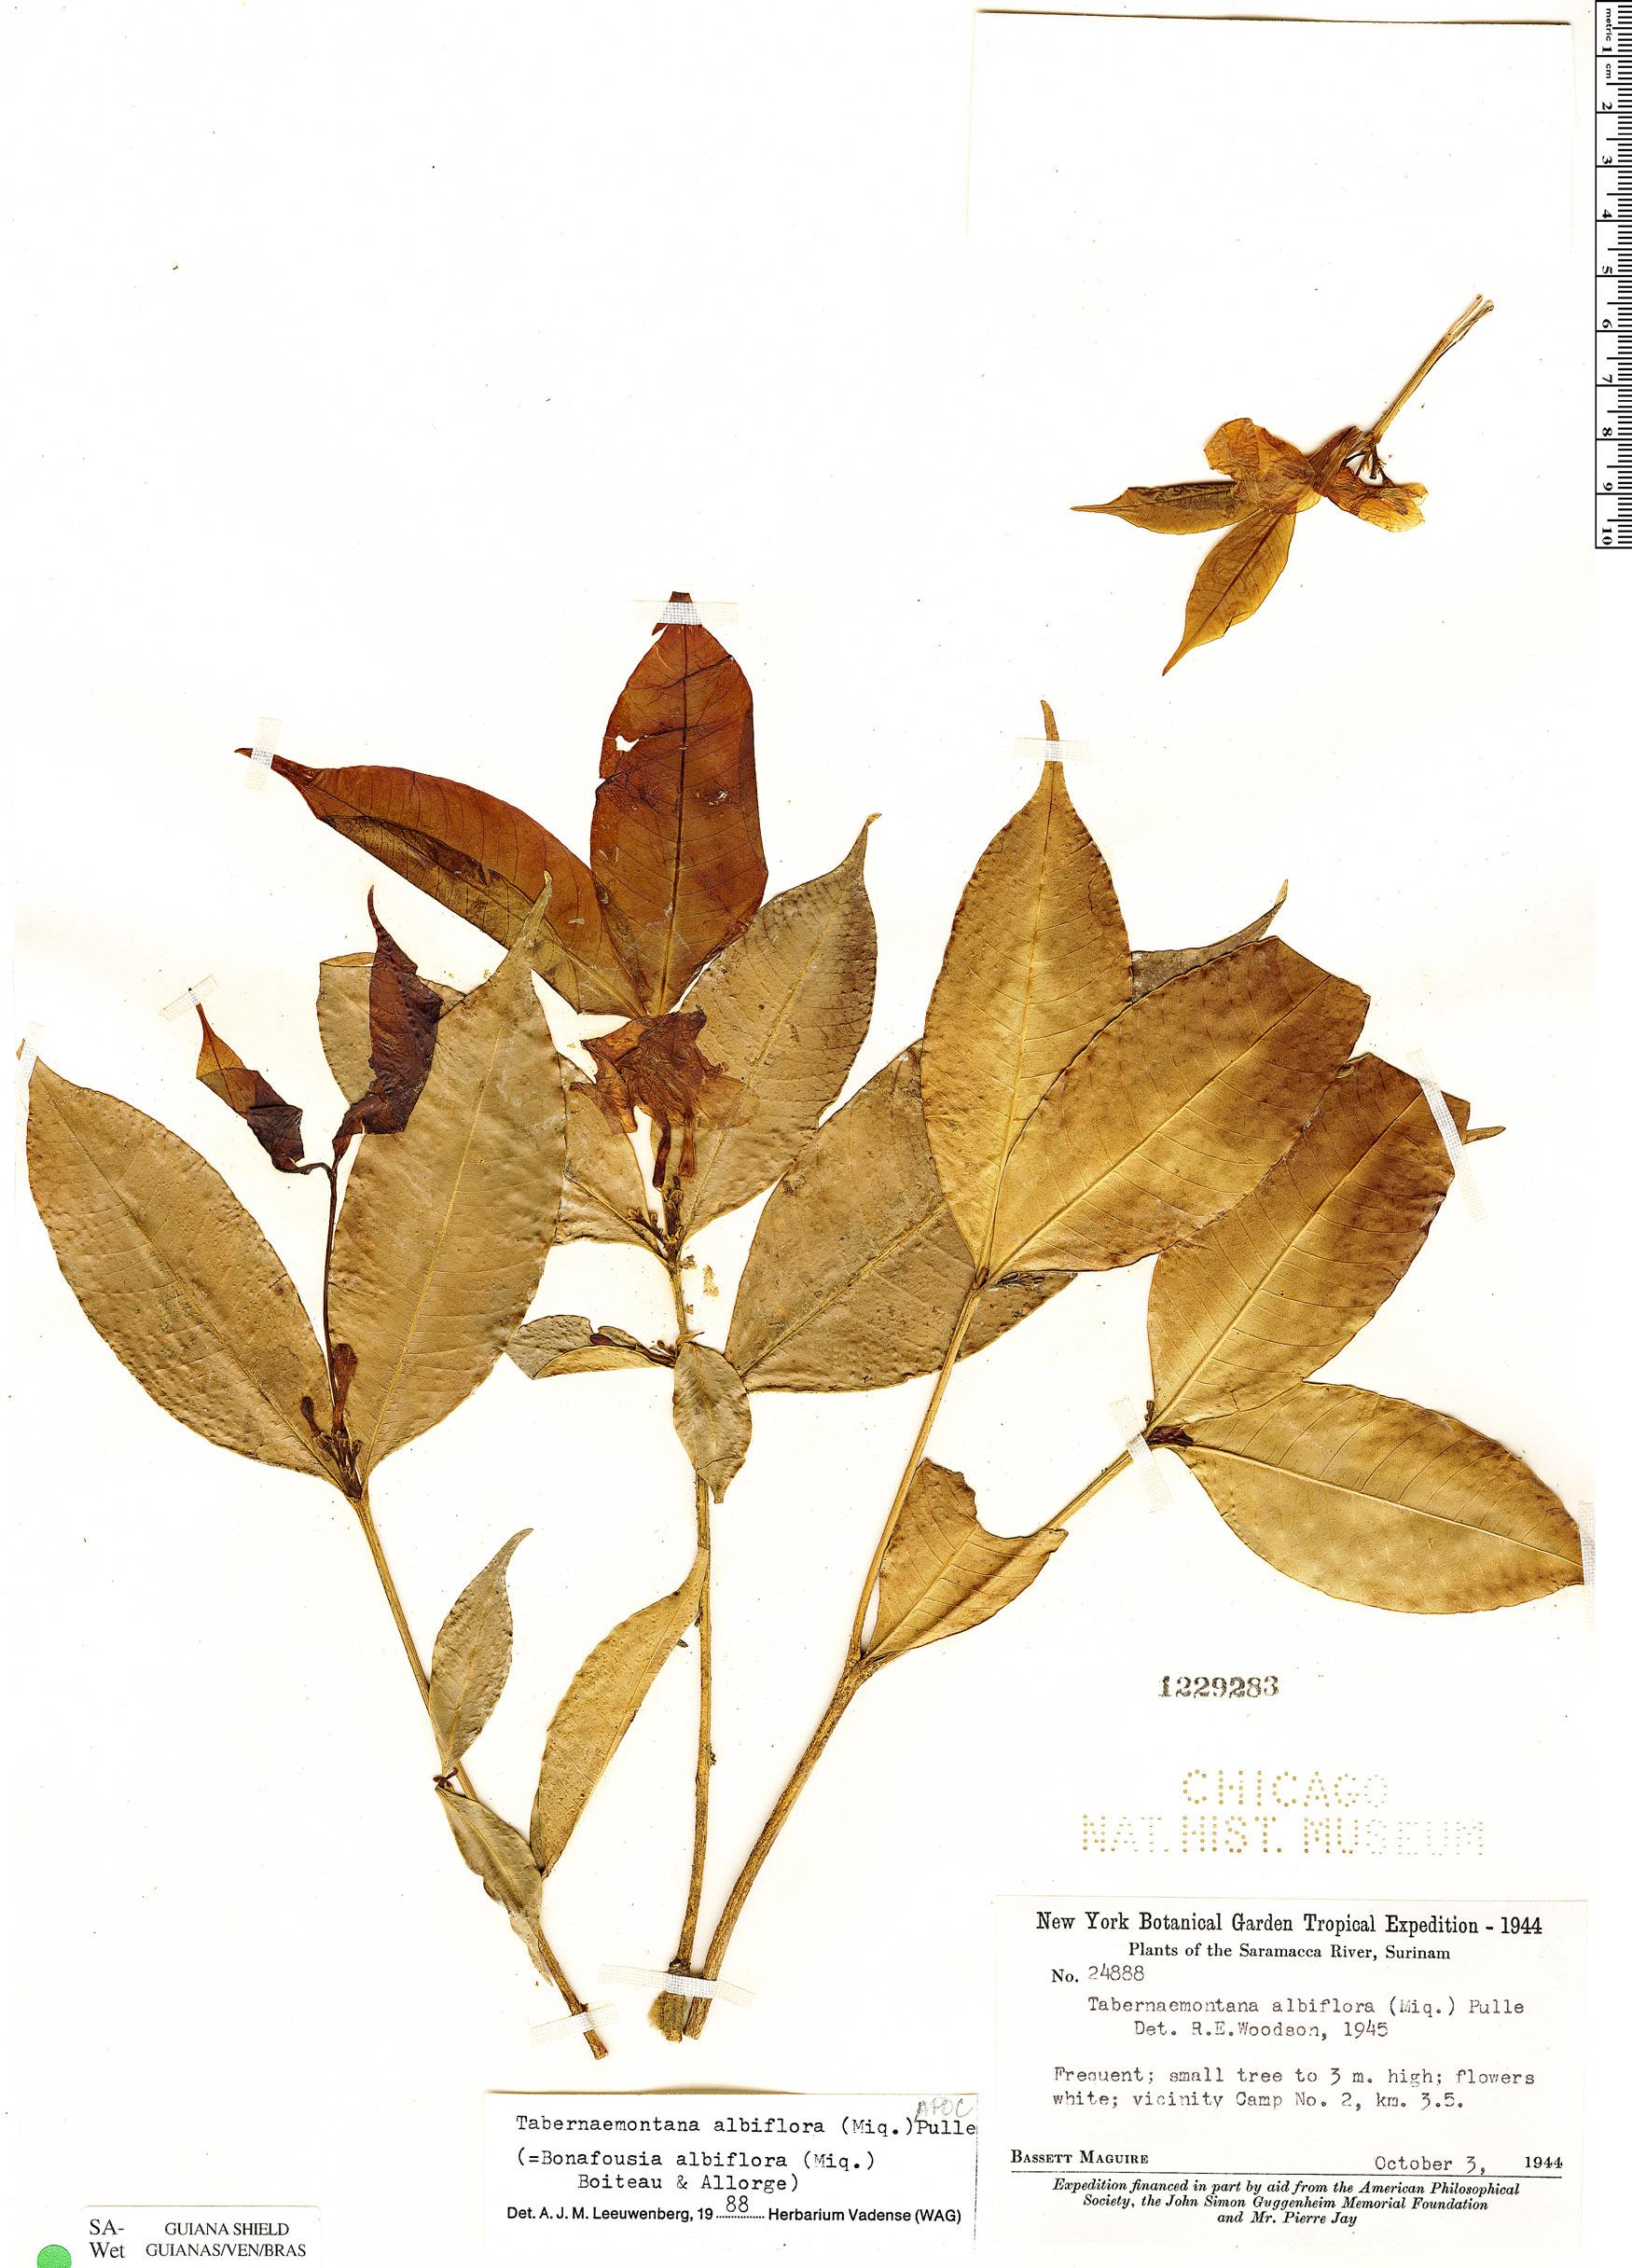 Specimen: Tabernaemontana albiflora